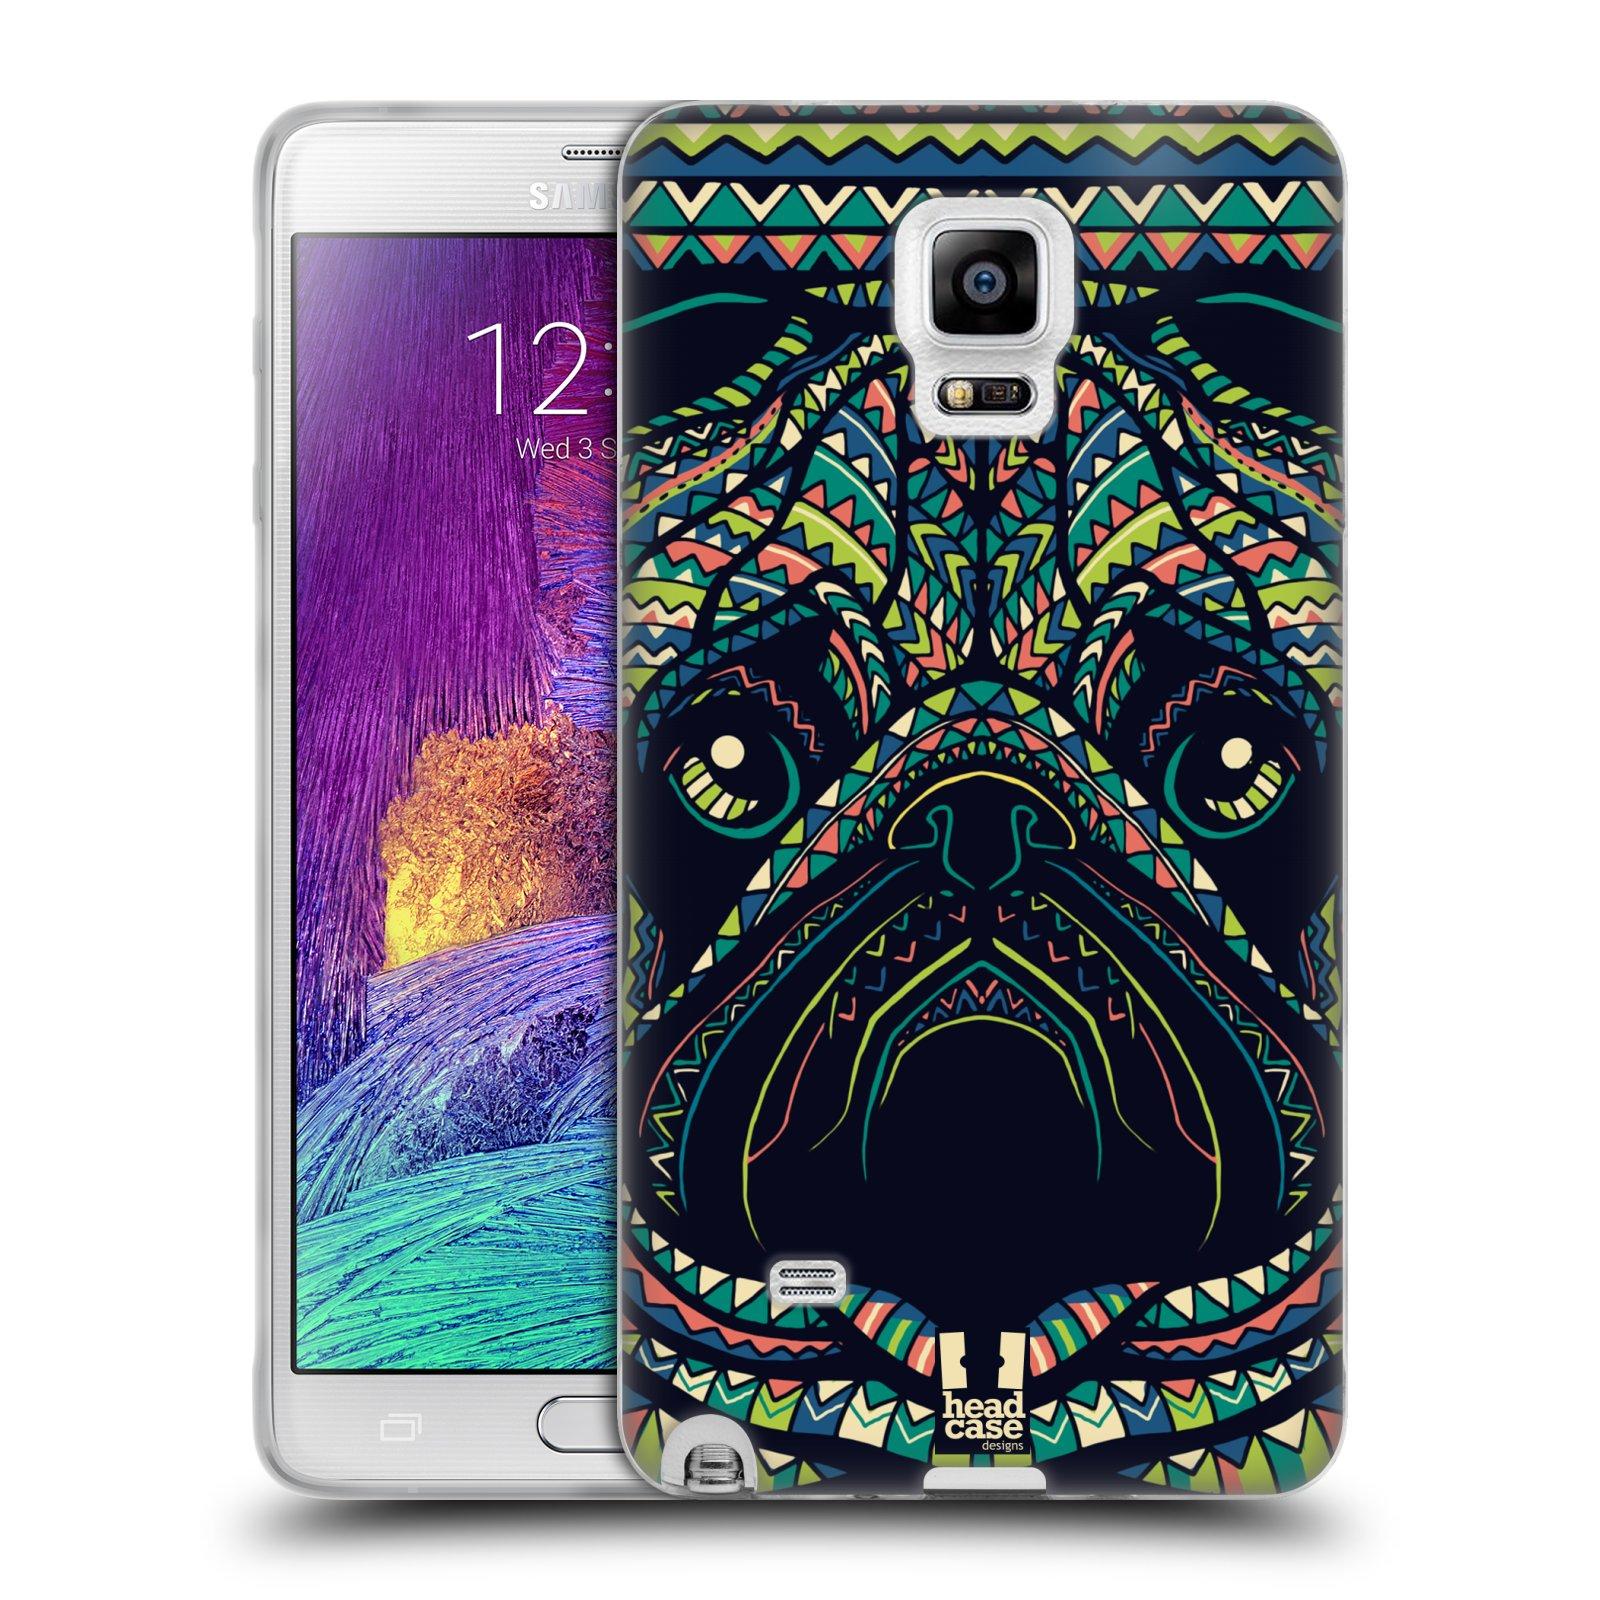 HEAD CASE silikonový obal na mobil Samsung Galaxy Note 4 (N910) vzor Aztécký motiv zvíře 3 mopsík